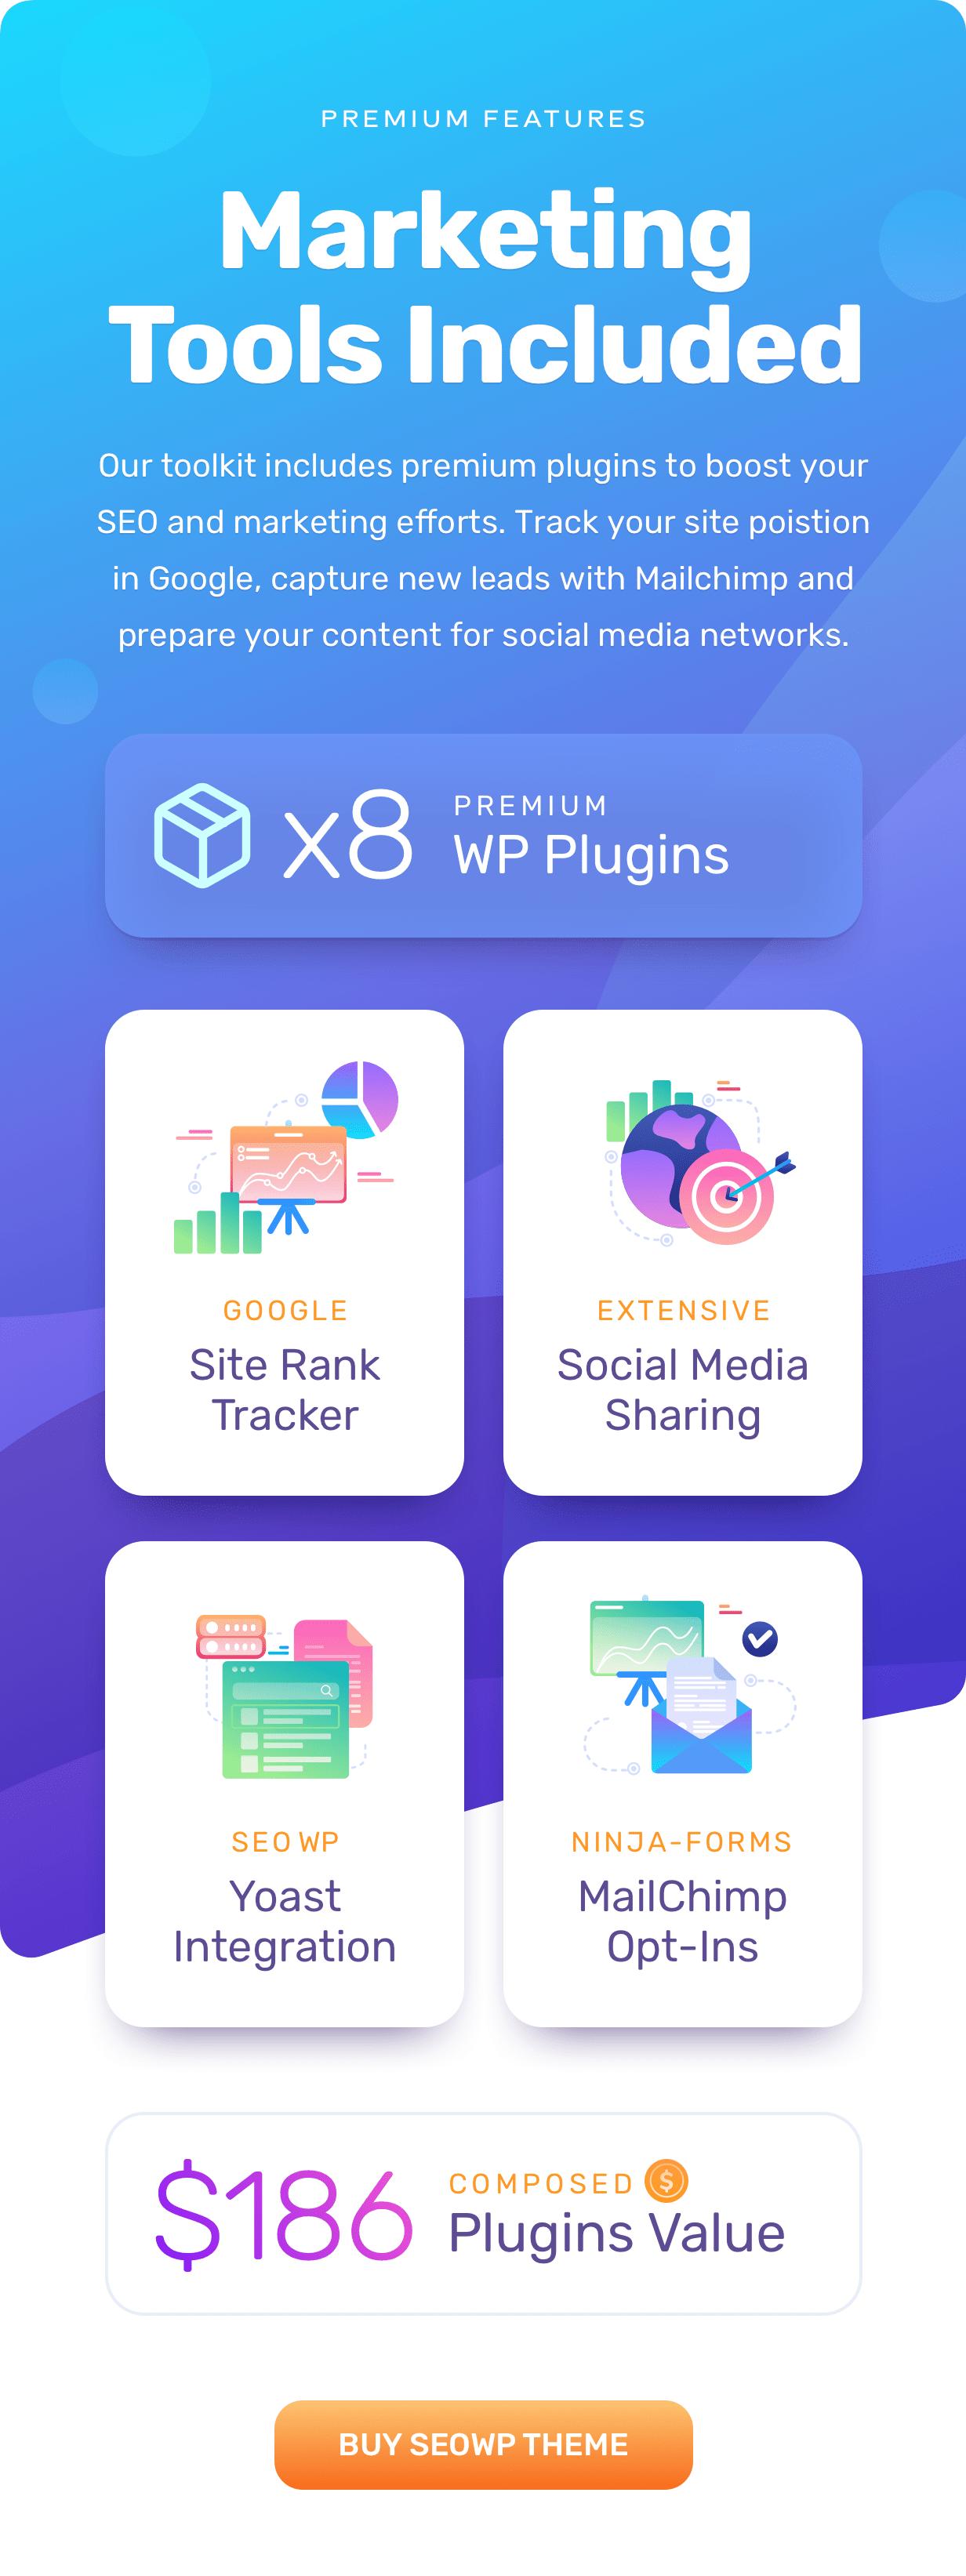 b plugins - SEOWP | SEO & Digital Marketing WordPress Theme